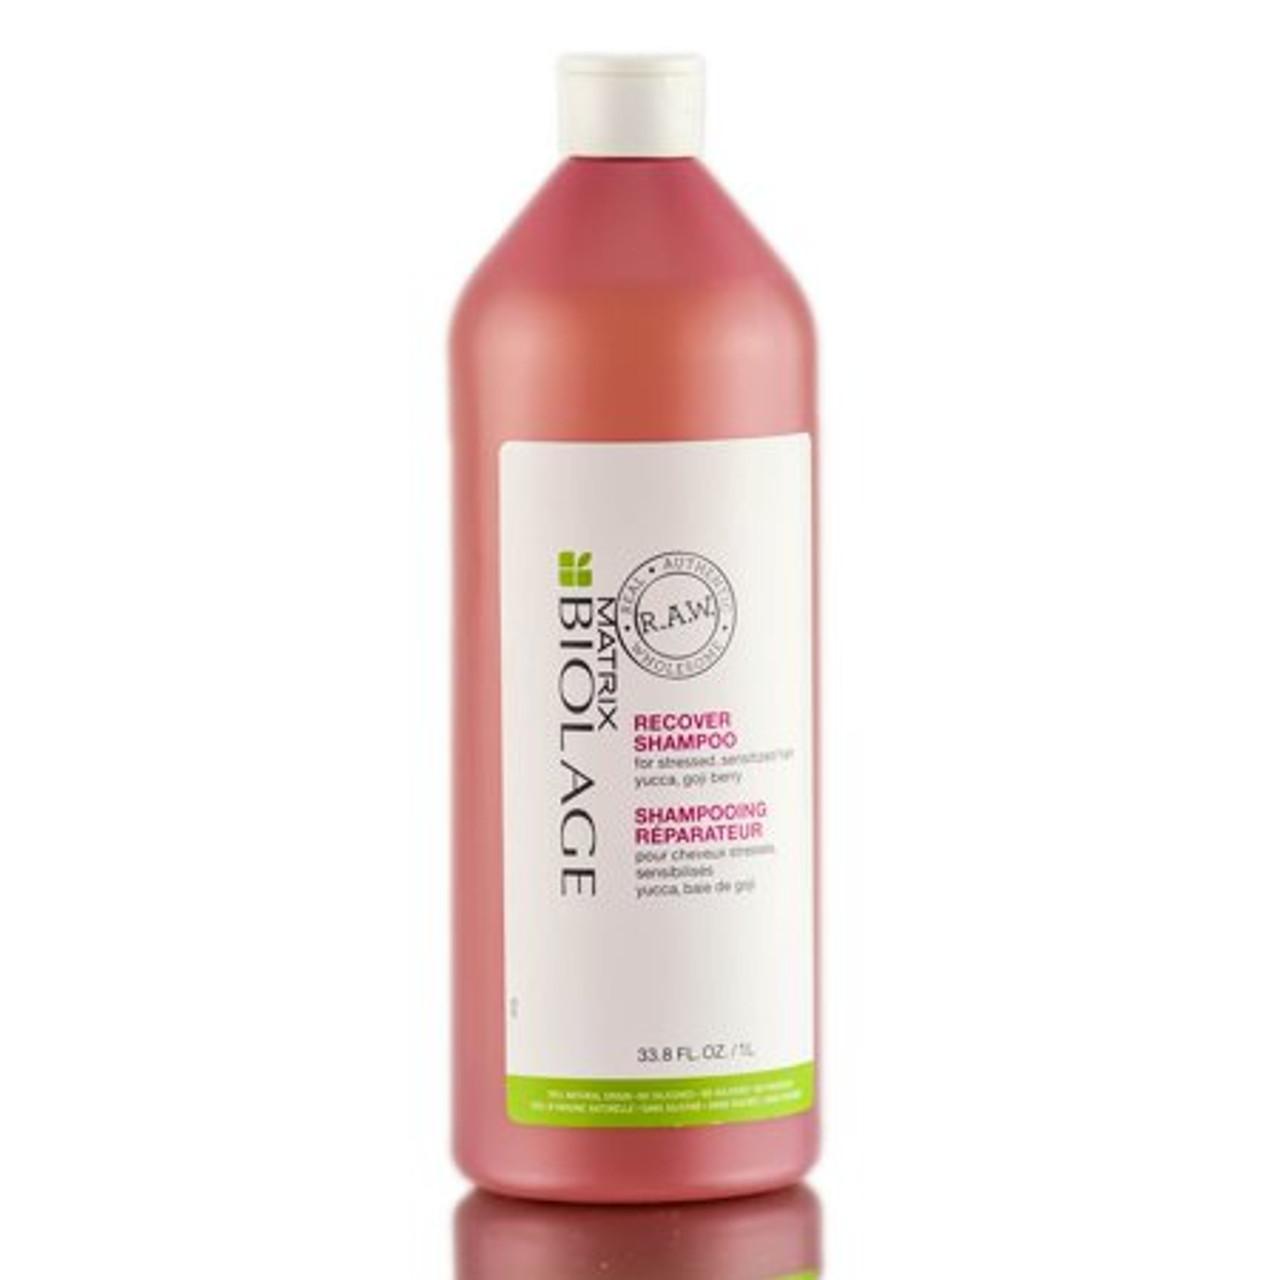 Biolage RAW Recover Shampoo Liter